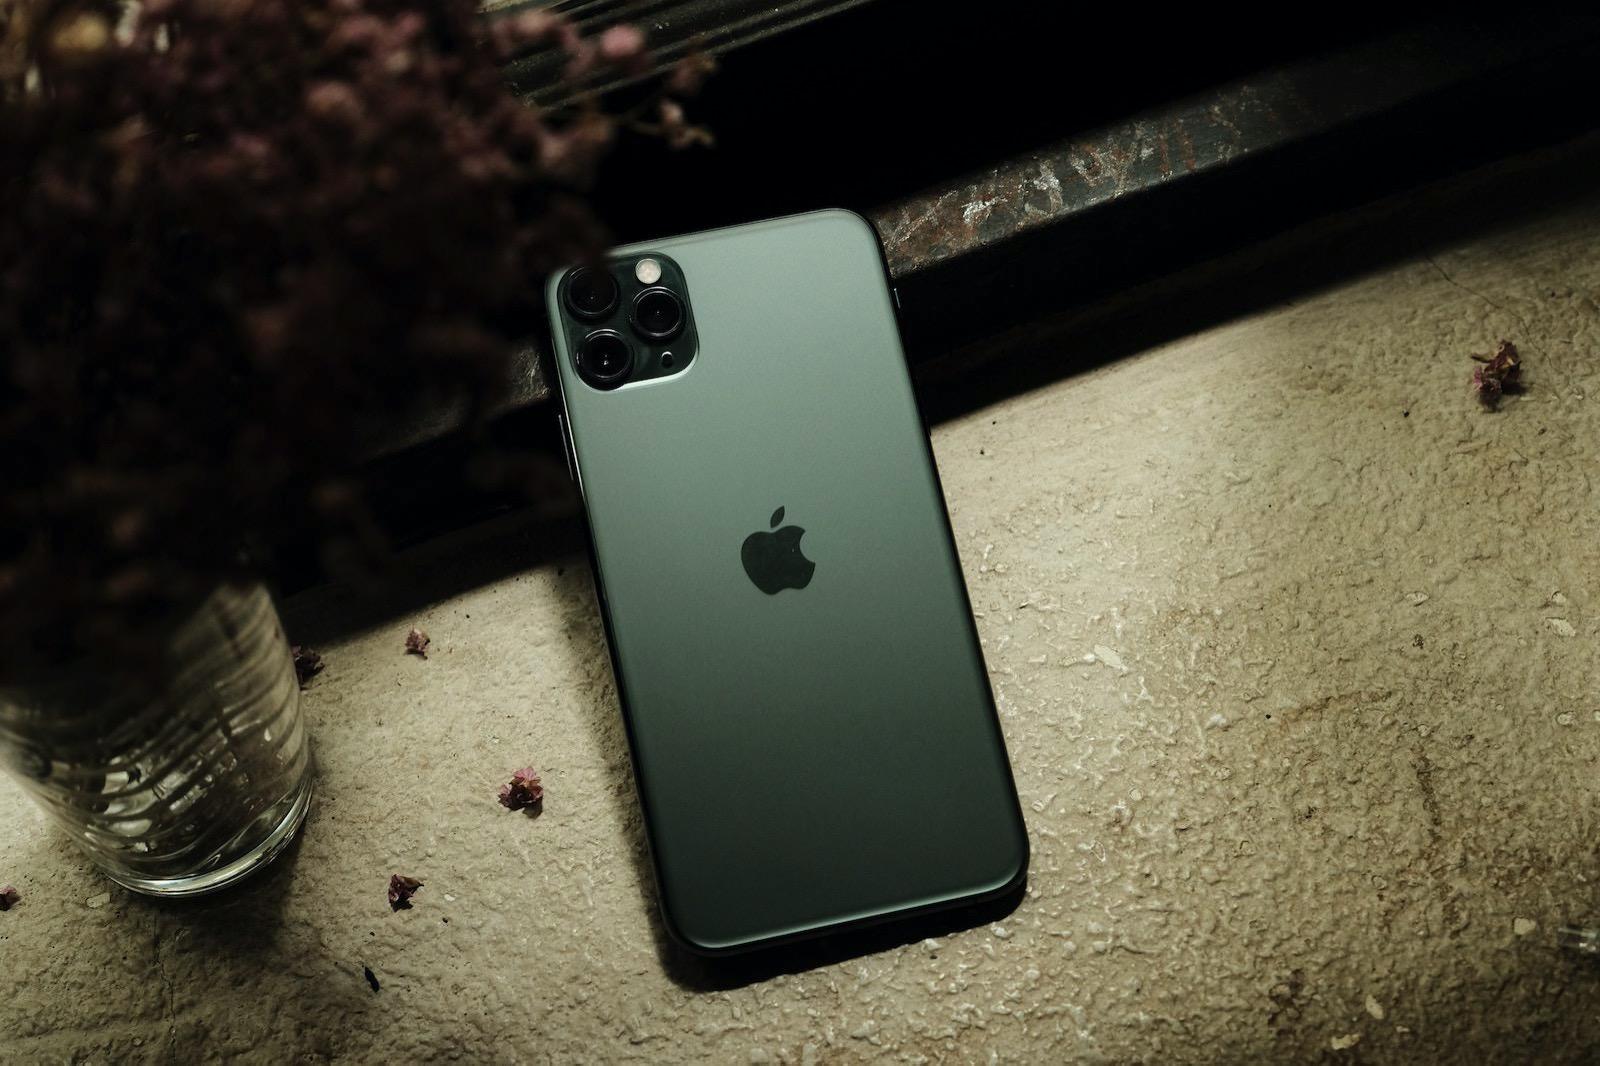 Tinh khuong dfpH2K2C5Q unsplash iphone 11 pro midnight green